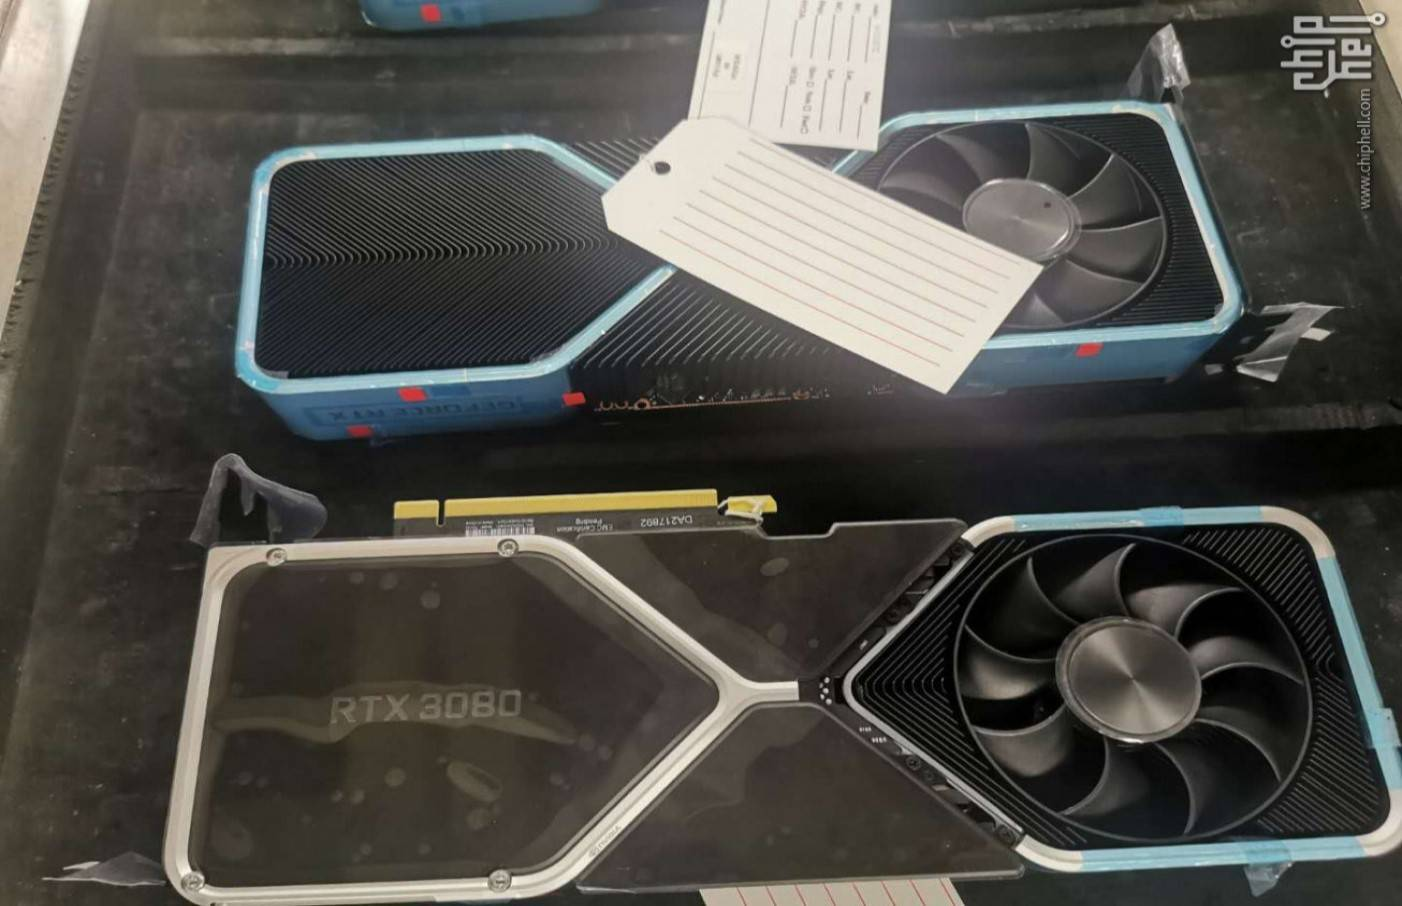 RTX 3080 heatsink